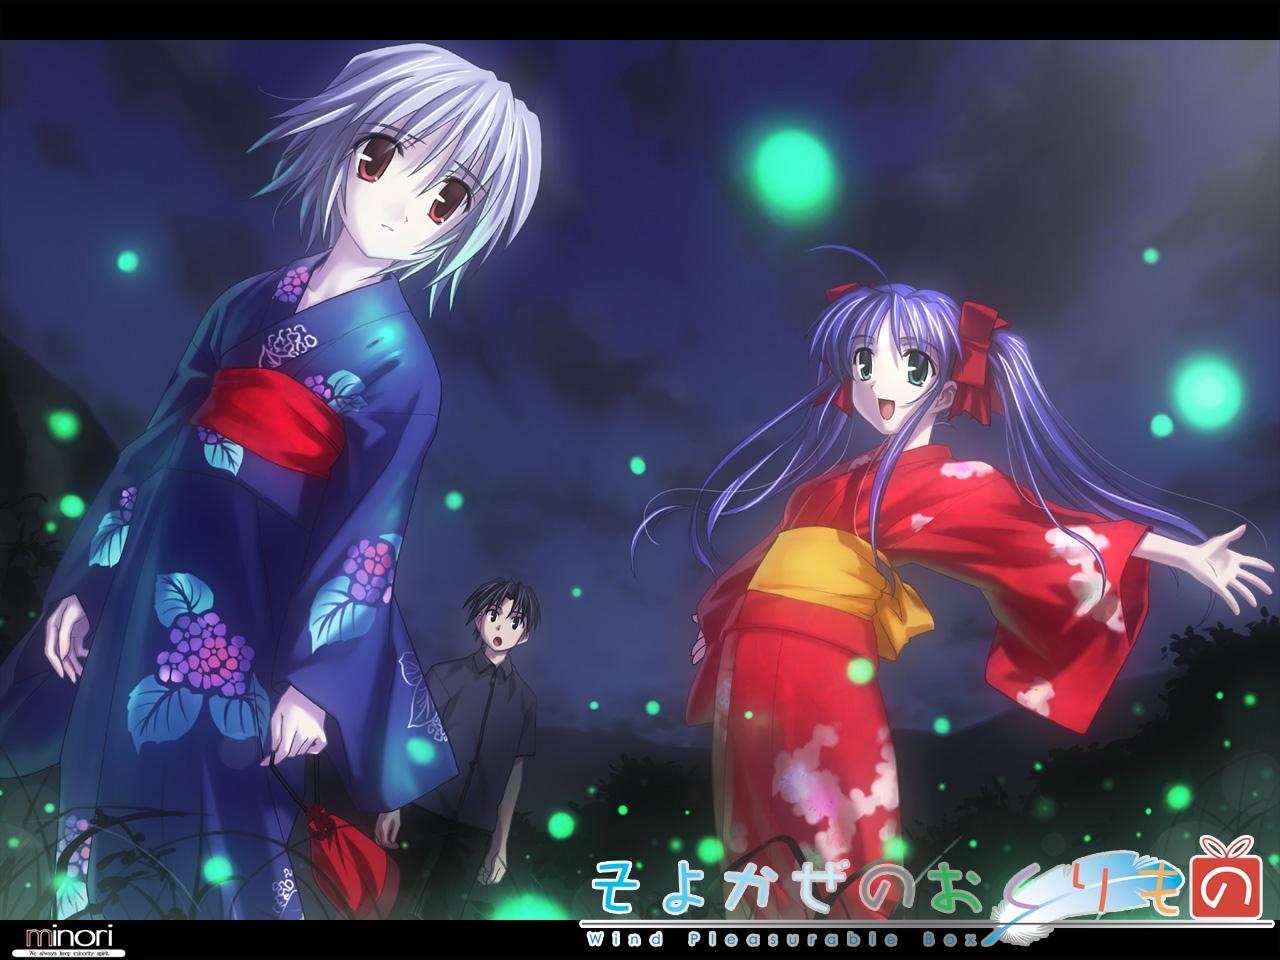 blue_hair gray_hair green_eyes japanese_clothes kimono long_hair minori narukaze_minamo red_eyes tsukishiro_hikari twintails wind:_a_breath_of_heart